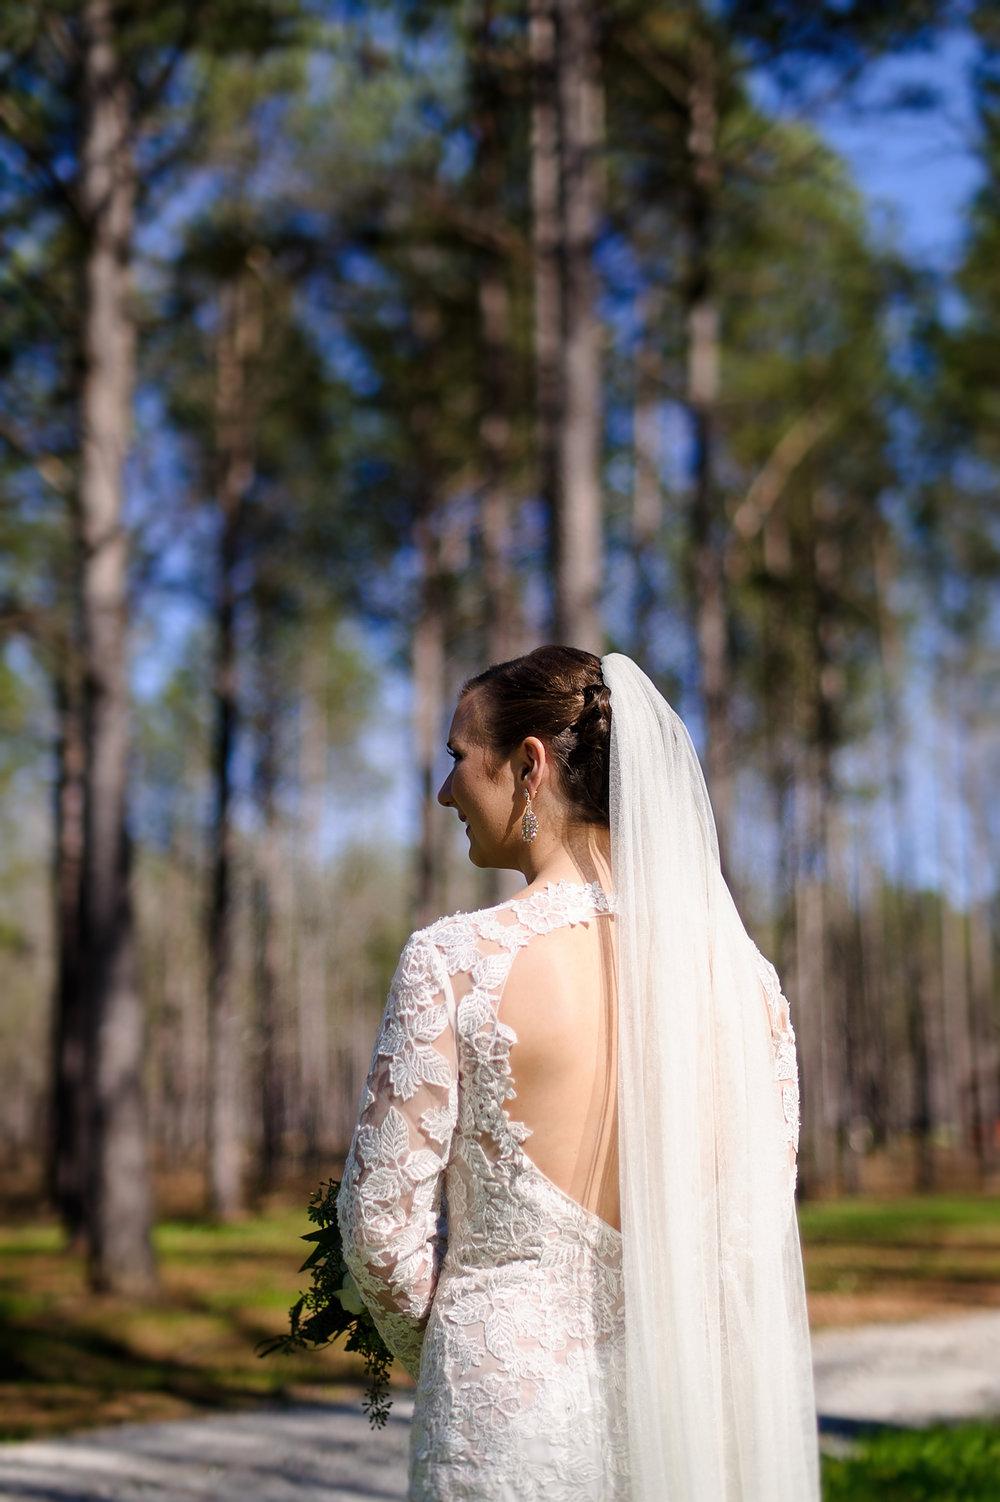 Outdoorwedding-3747.JPG